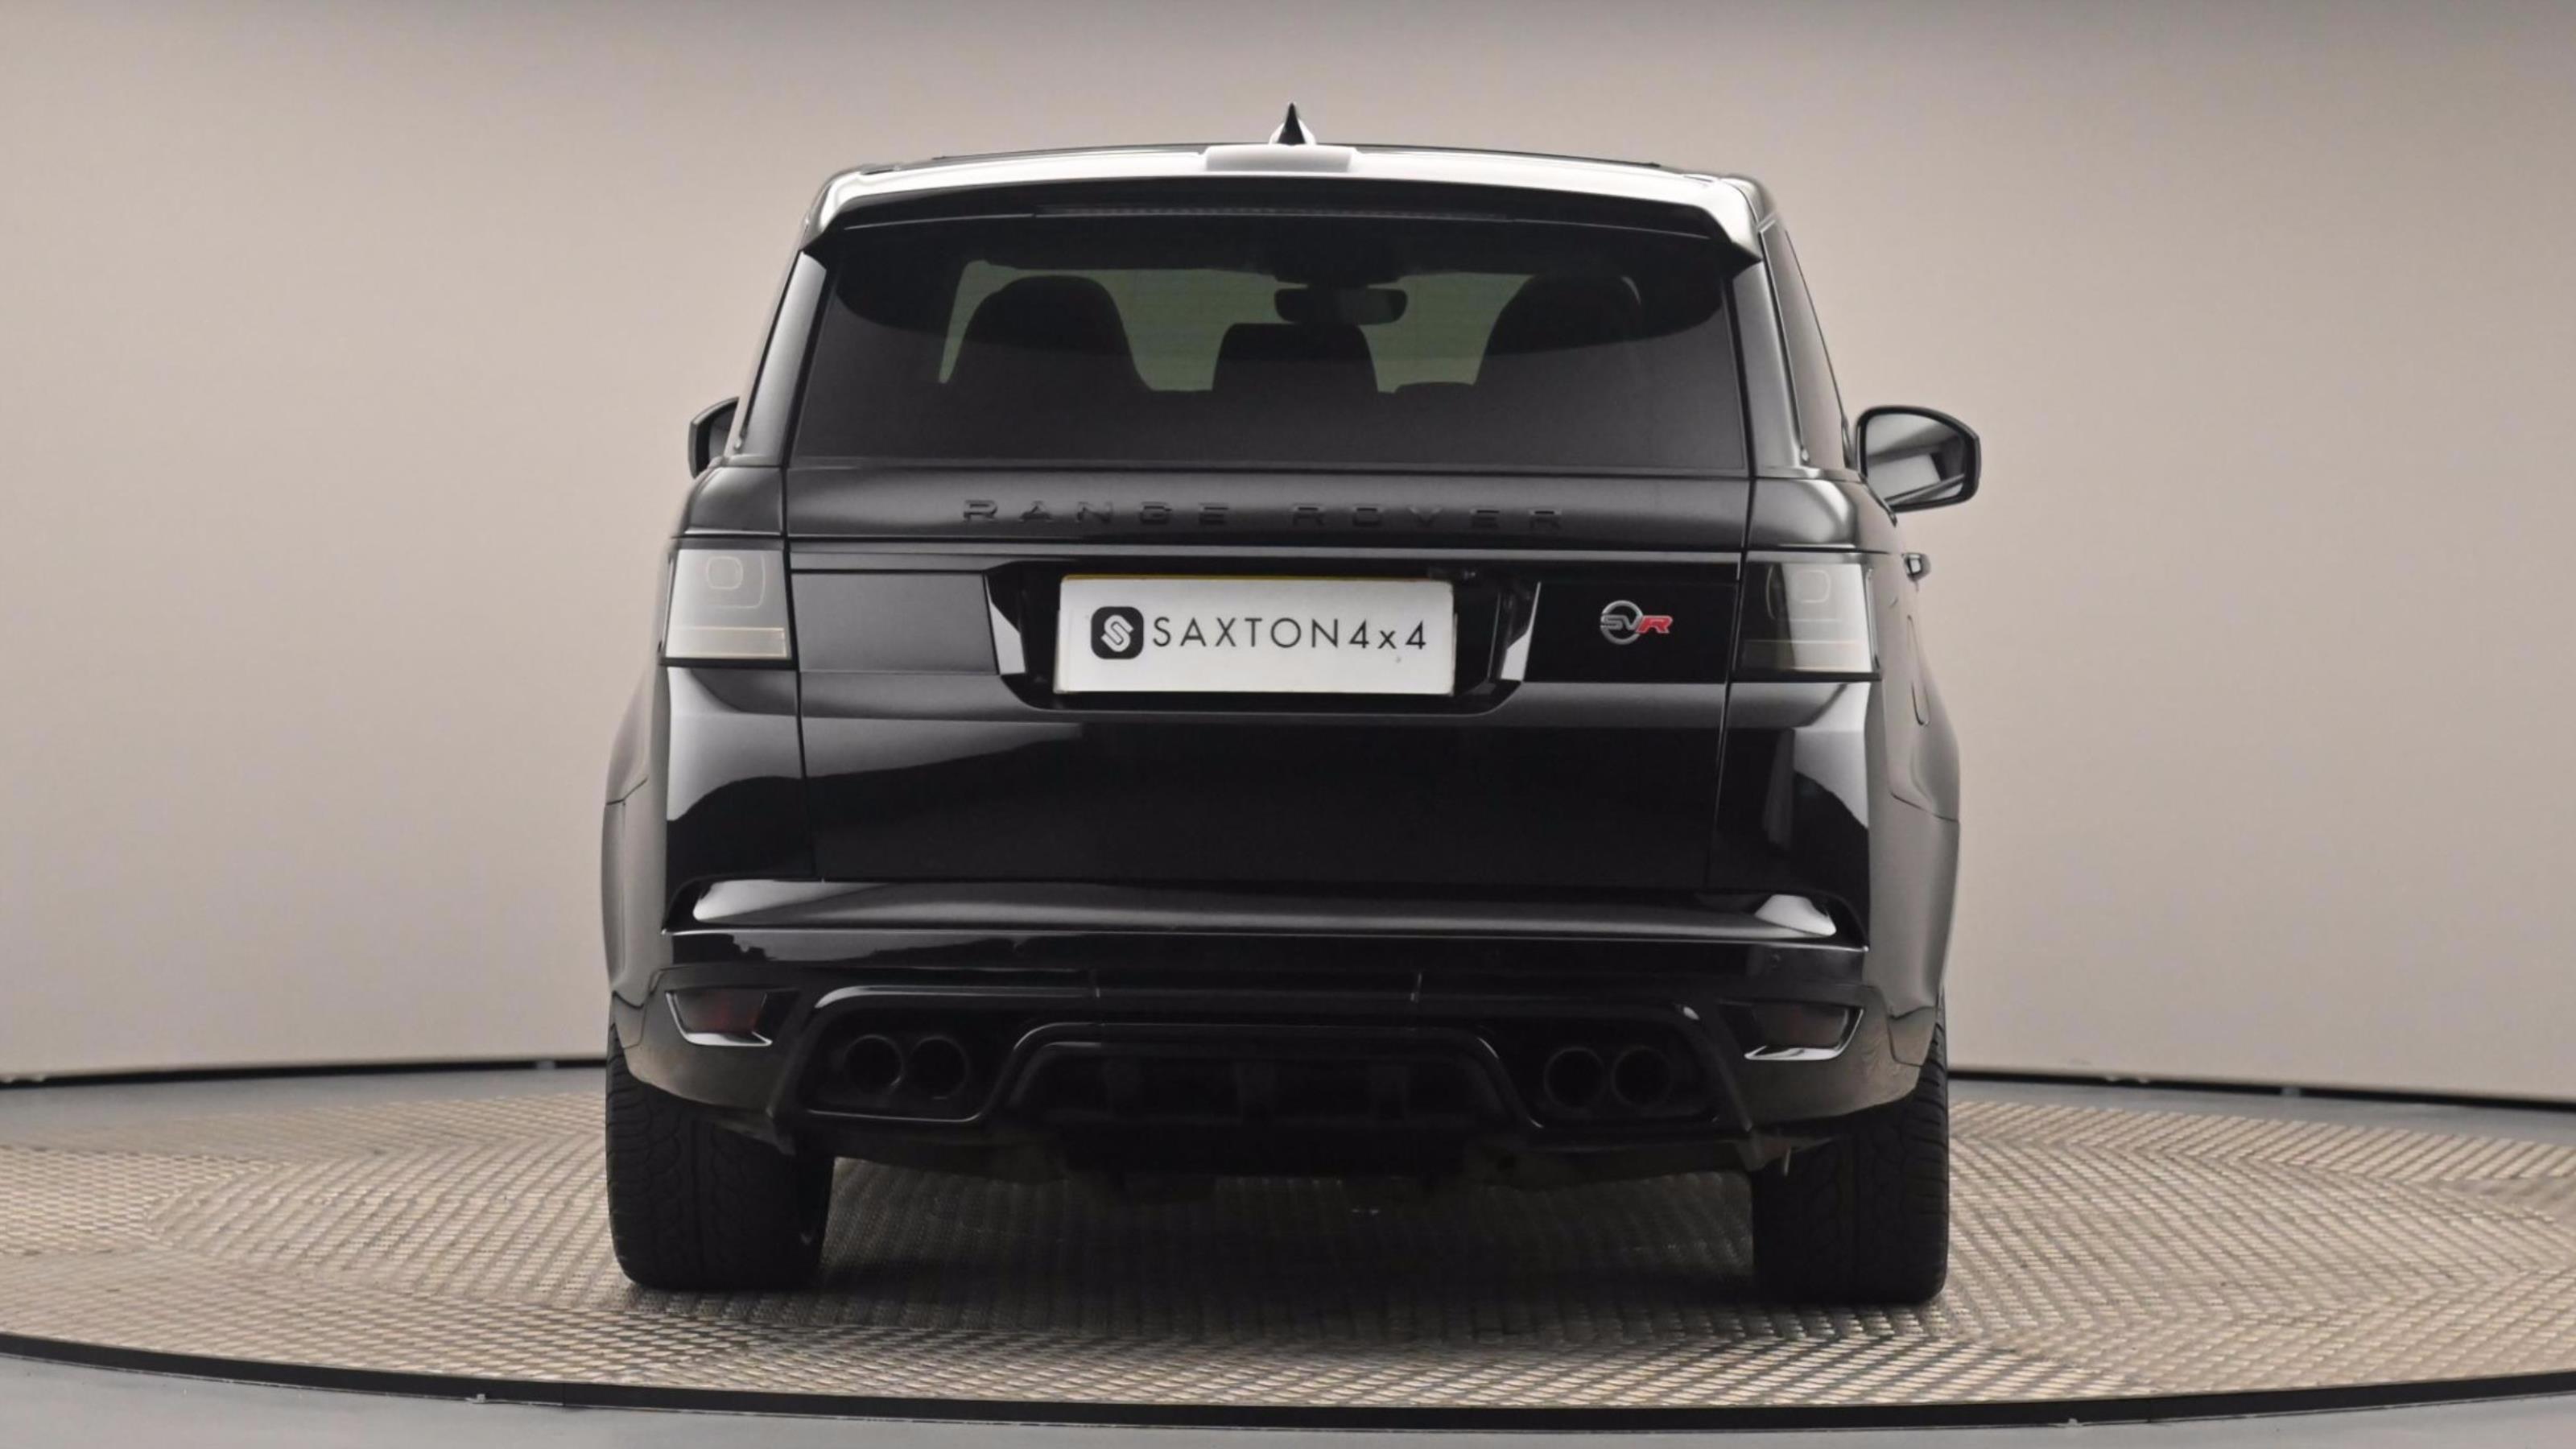 Used 2018 Land Rover Range Rover Sport SVR BLACK at Saxton4x4